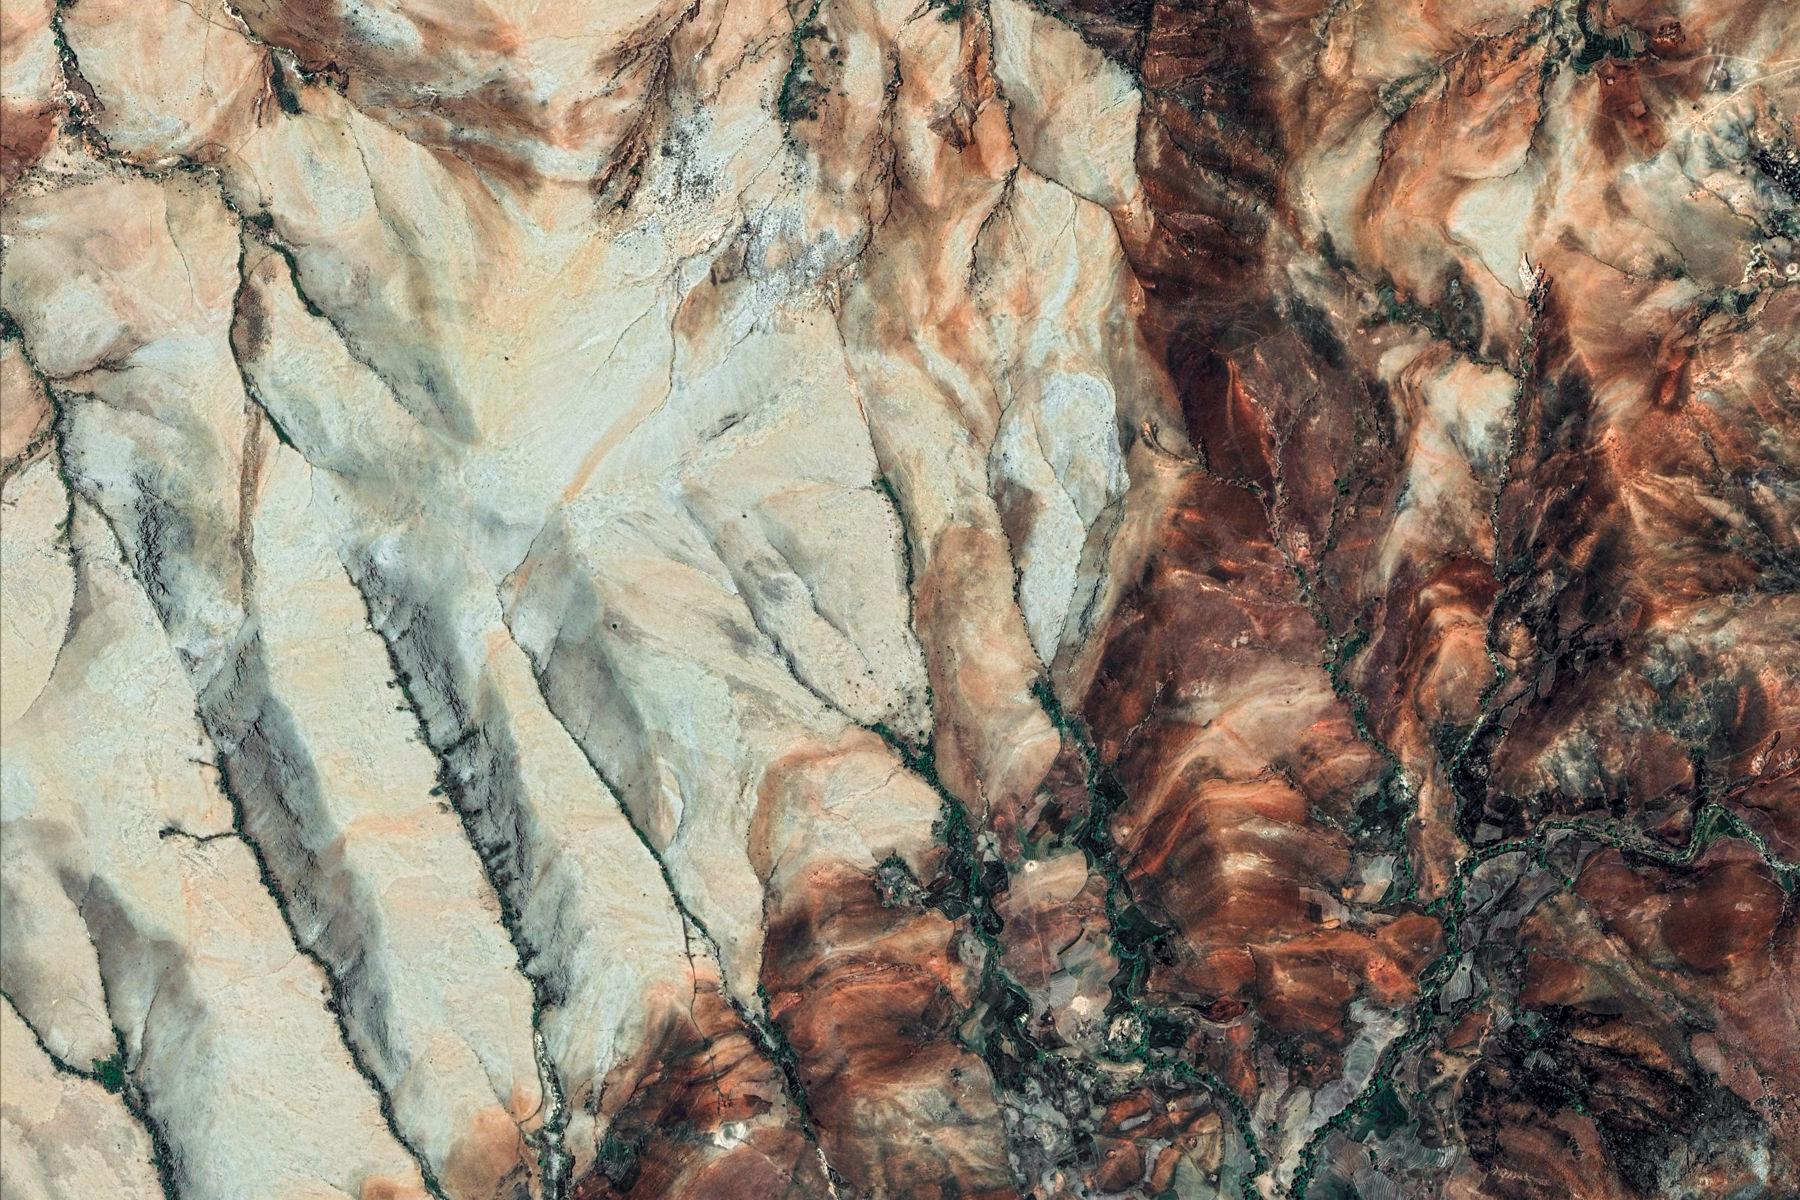 google-earth-Madagascar-Ikalamavony-12629